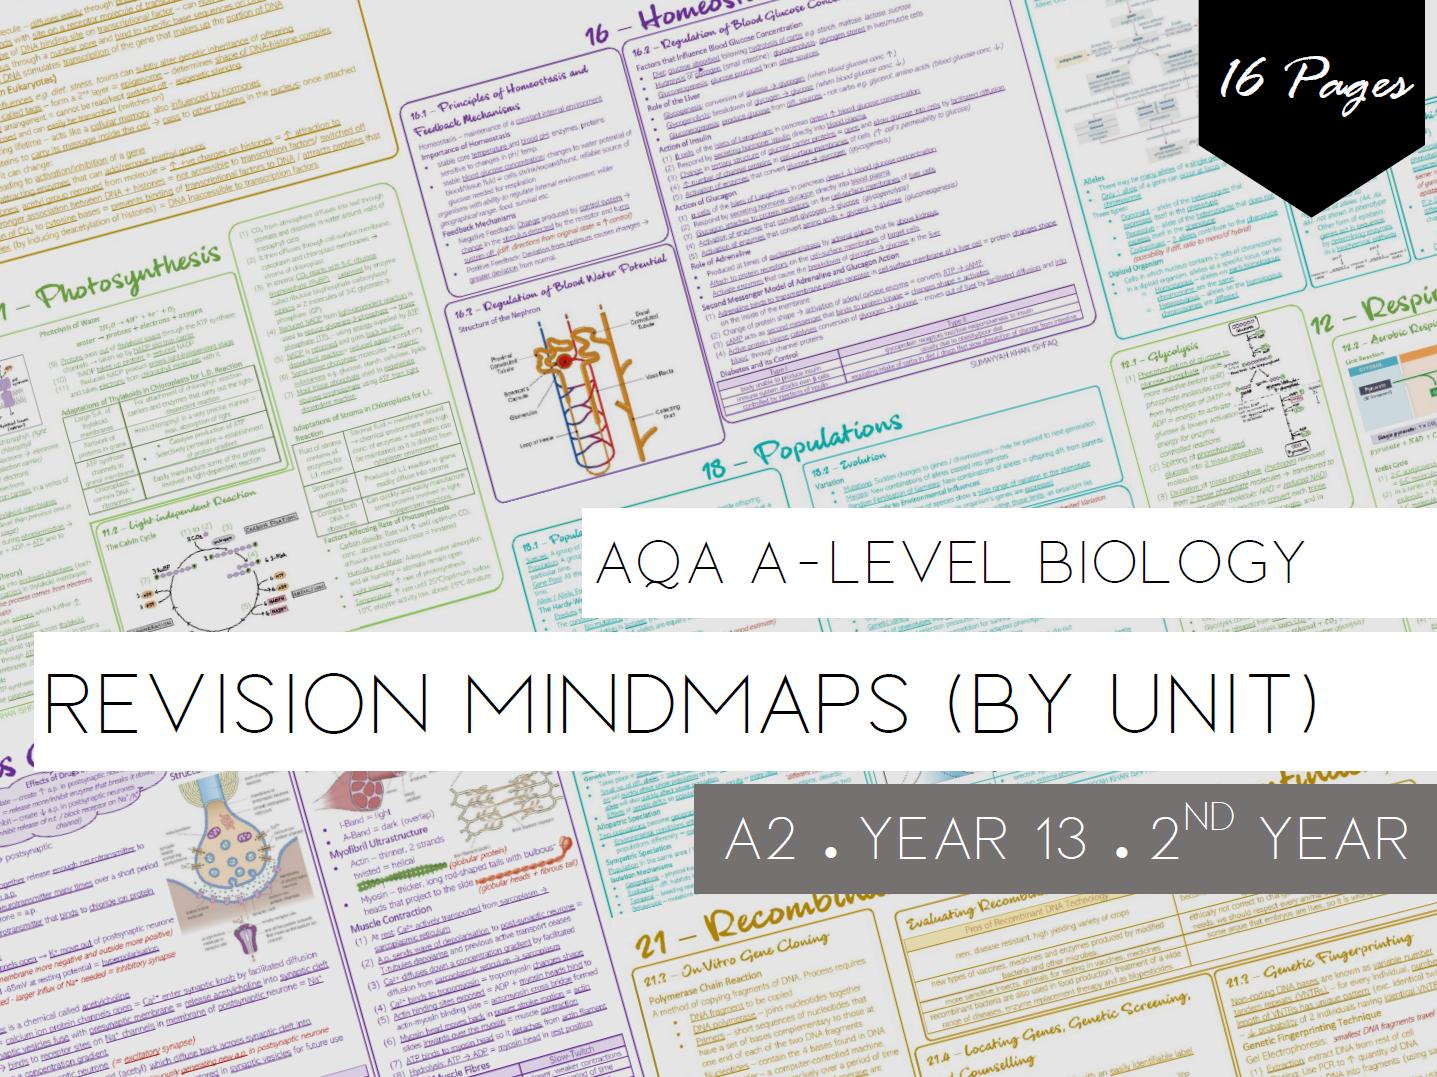 AQA A-Level - Year 13 / 2nd Year (Revision Mindmaps)